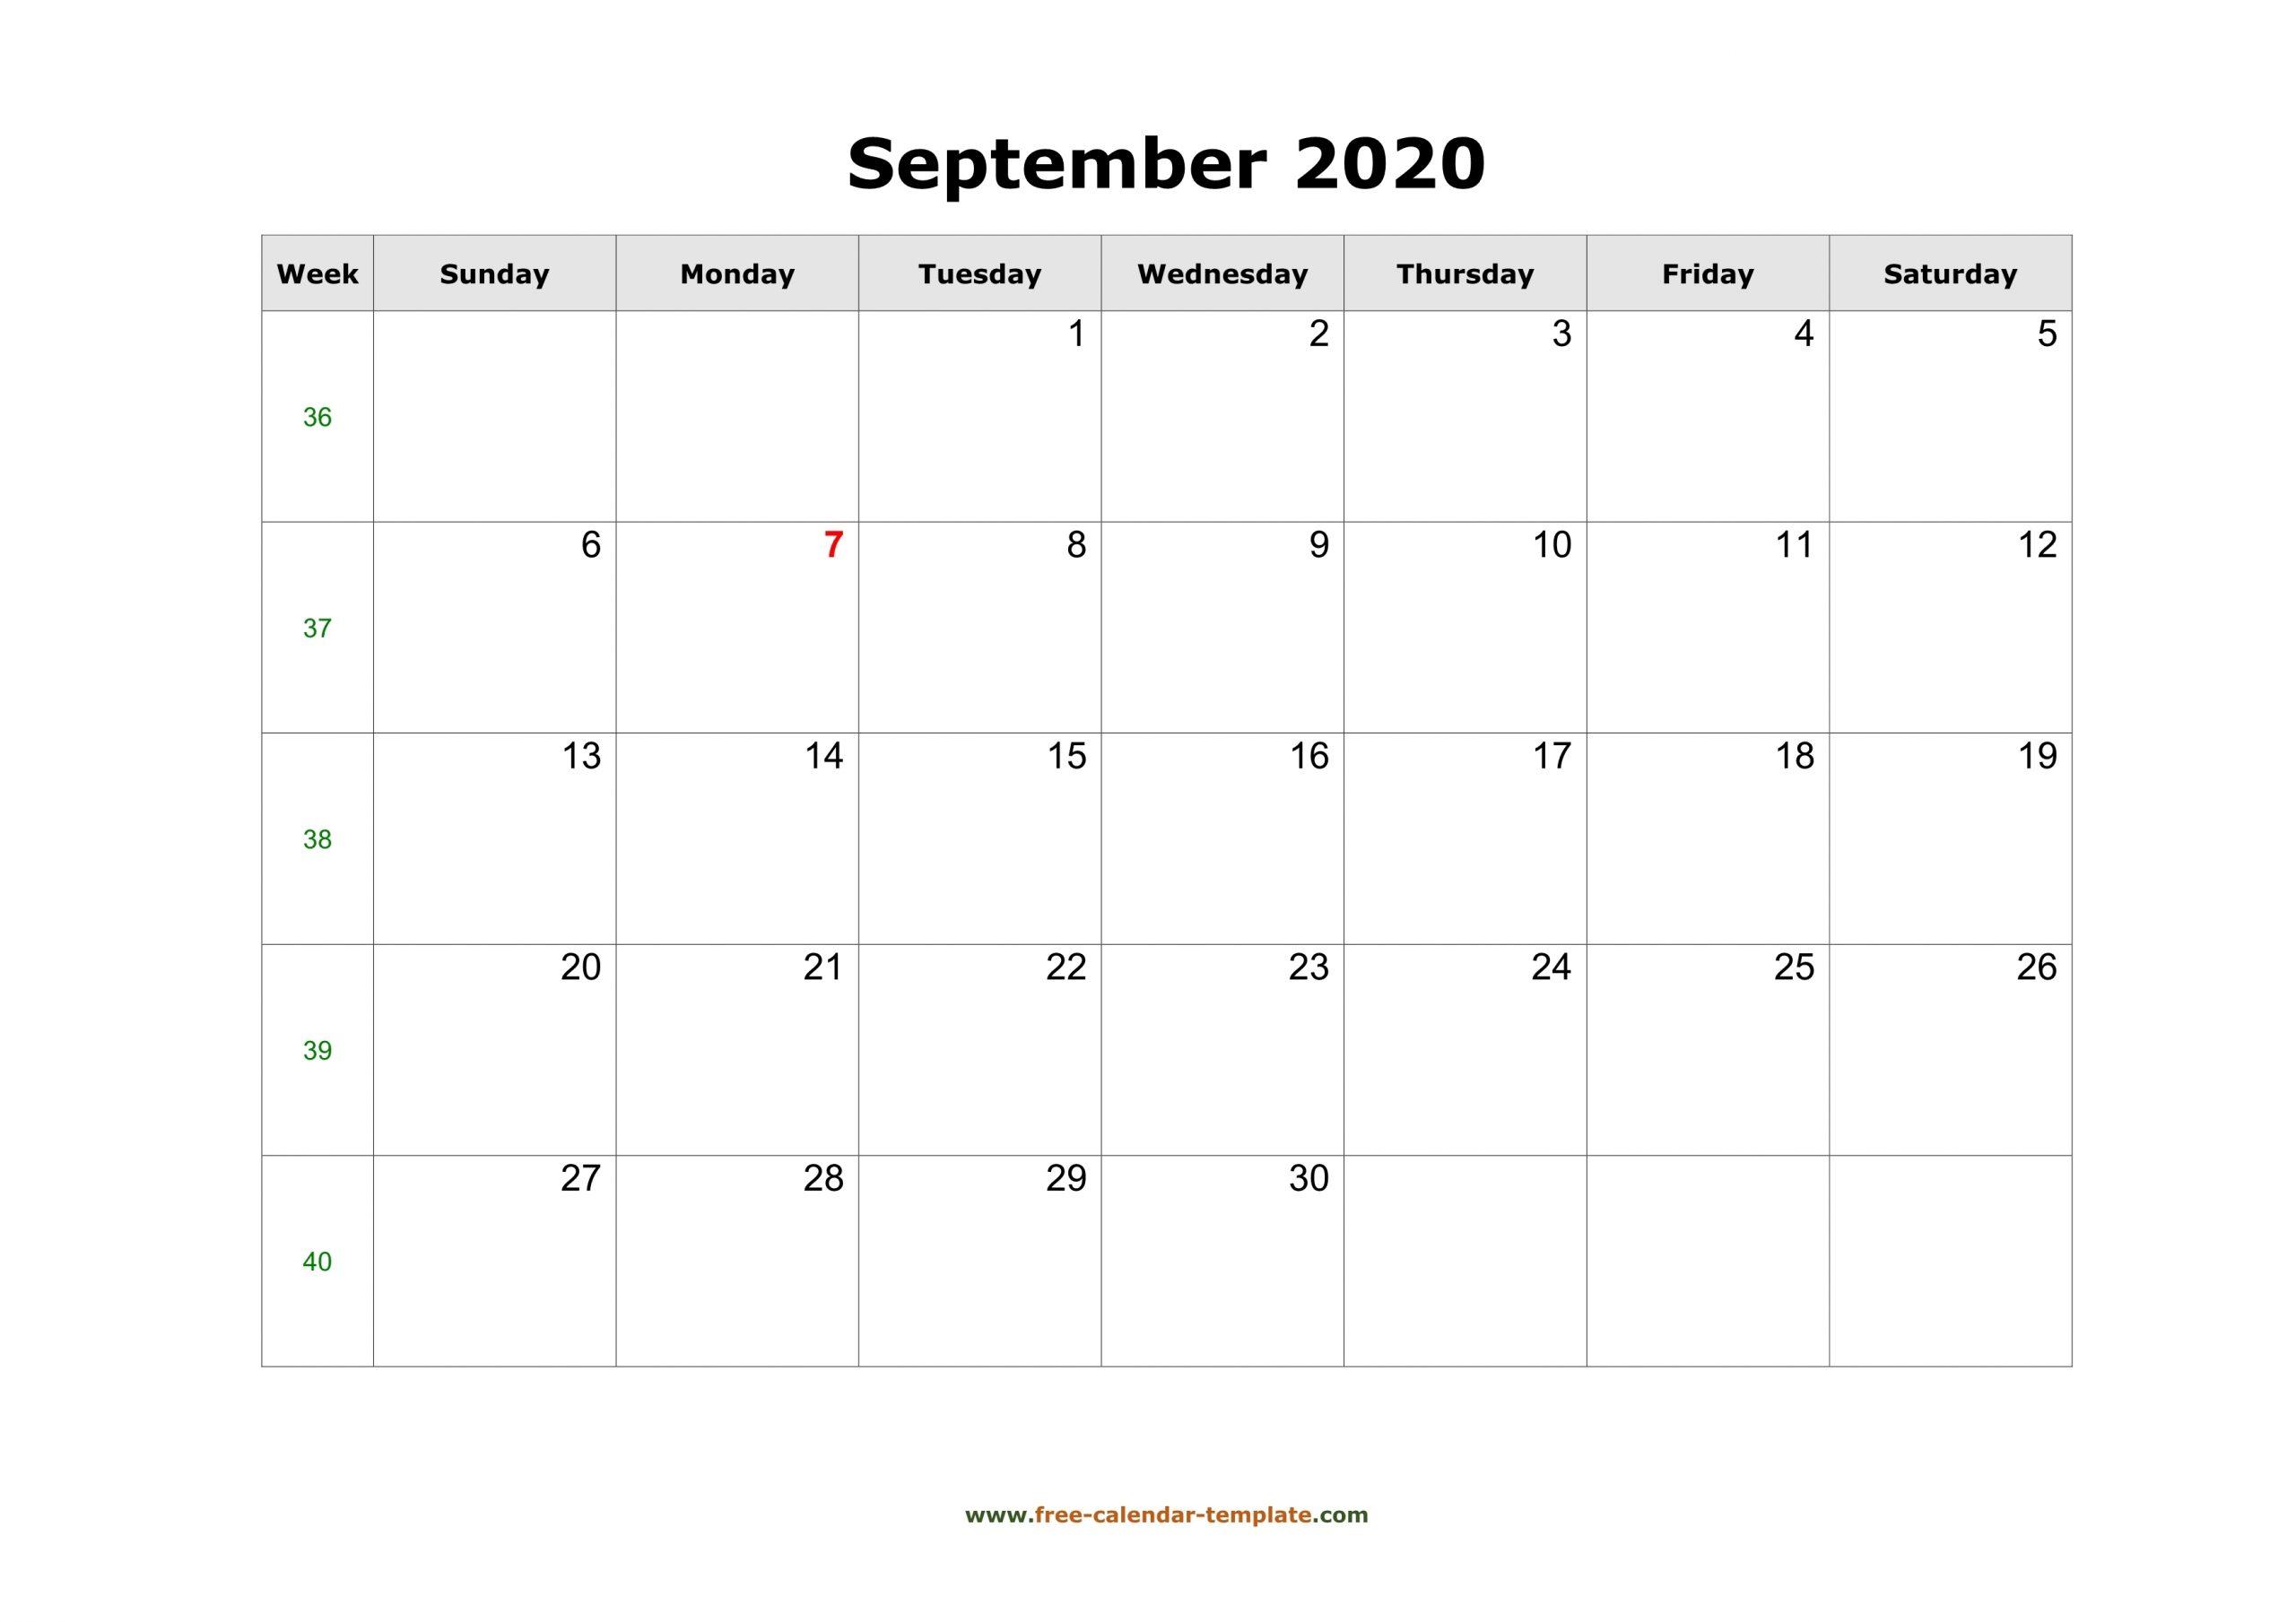 Simple September Calendar 2020 Large Box On Each Day For for Large Box Calendar 2020 Printable